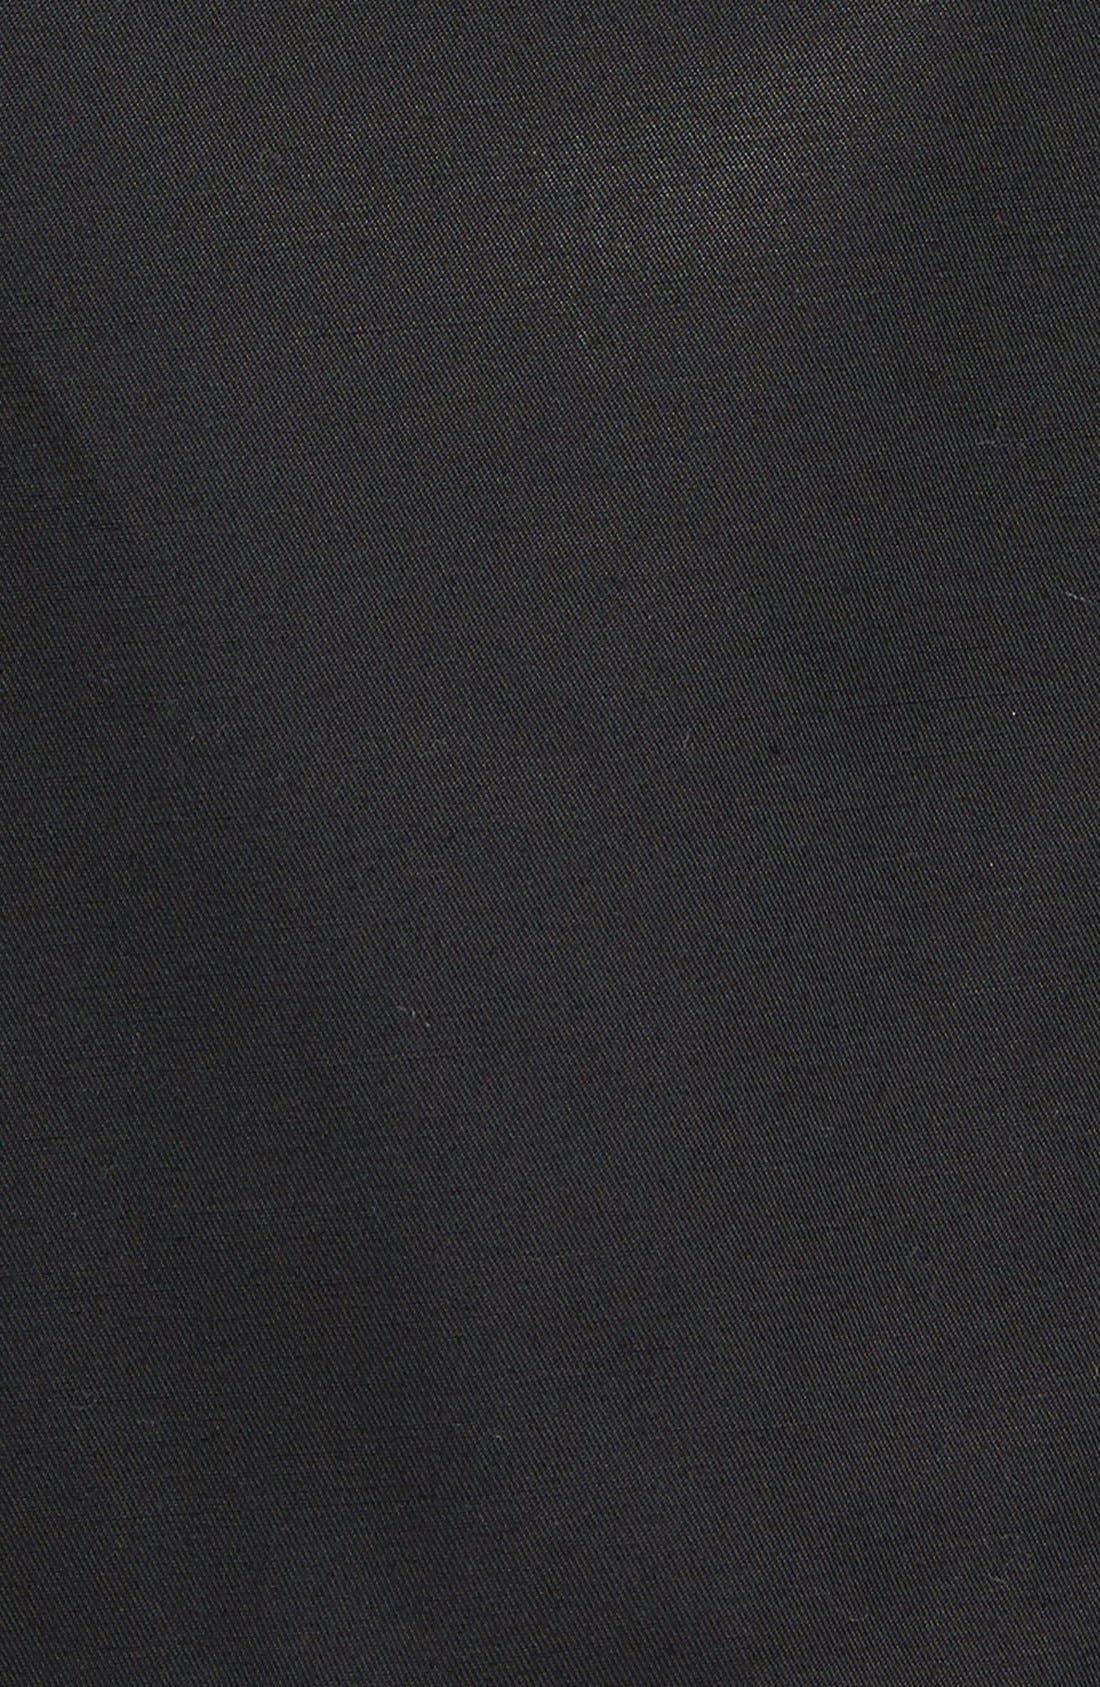 Alternate Image 2  - Via Spiga 'Scarpa' Single Breasted Trench Coat (Plus Size)